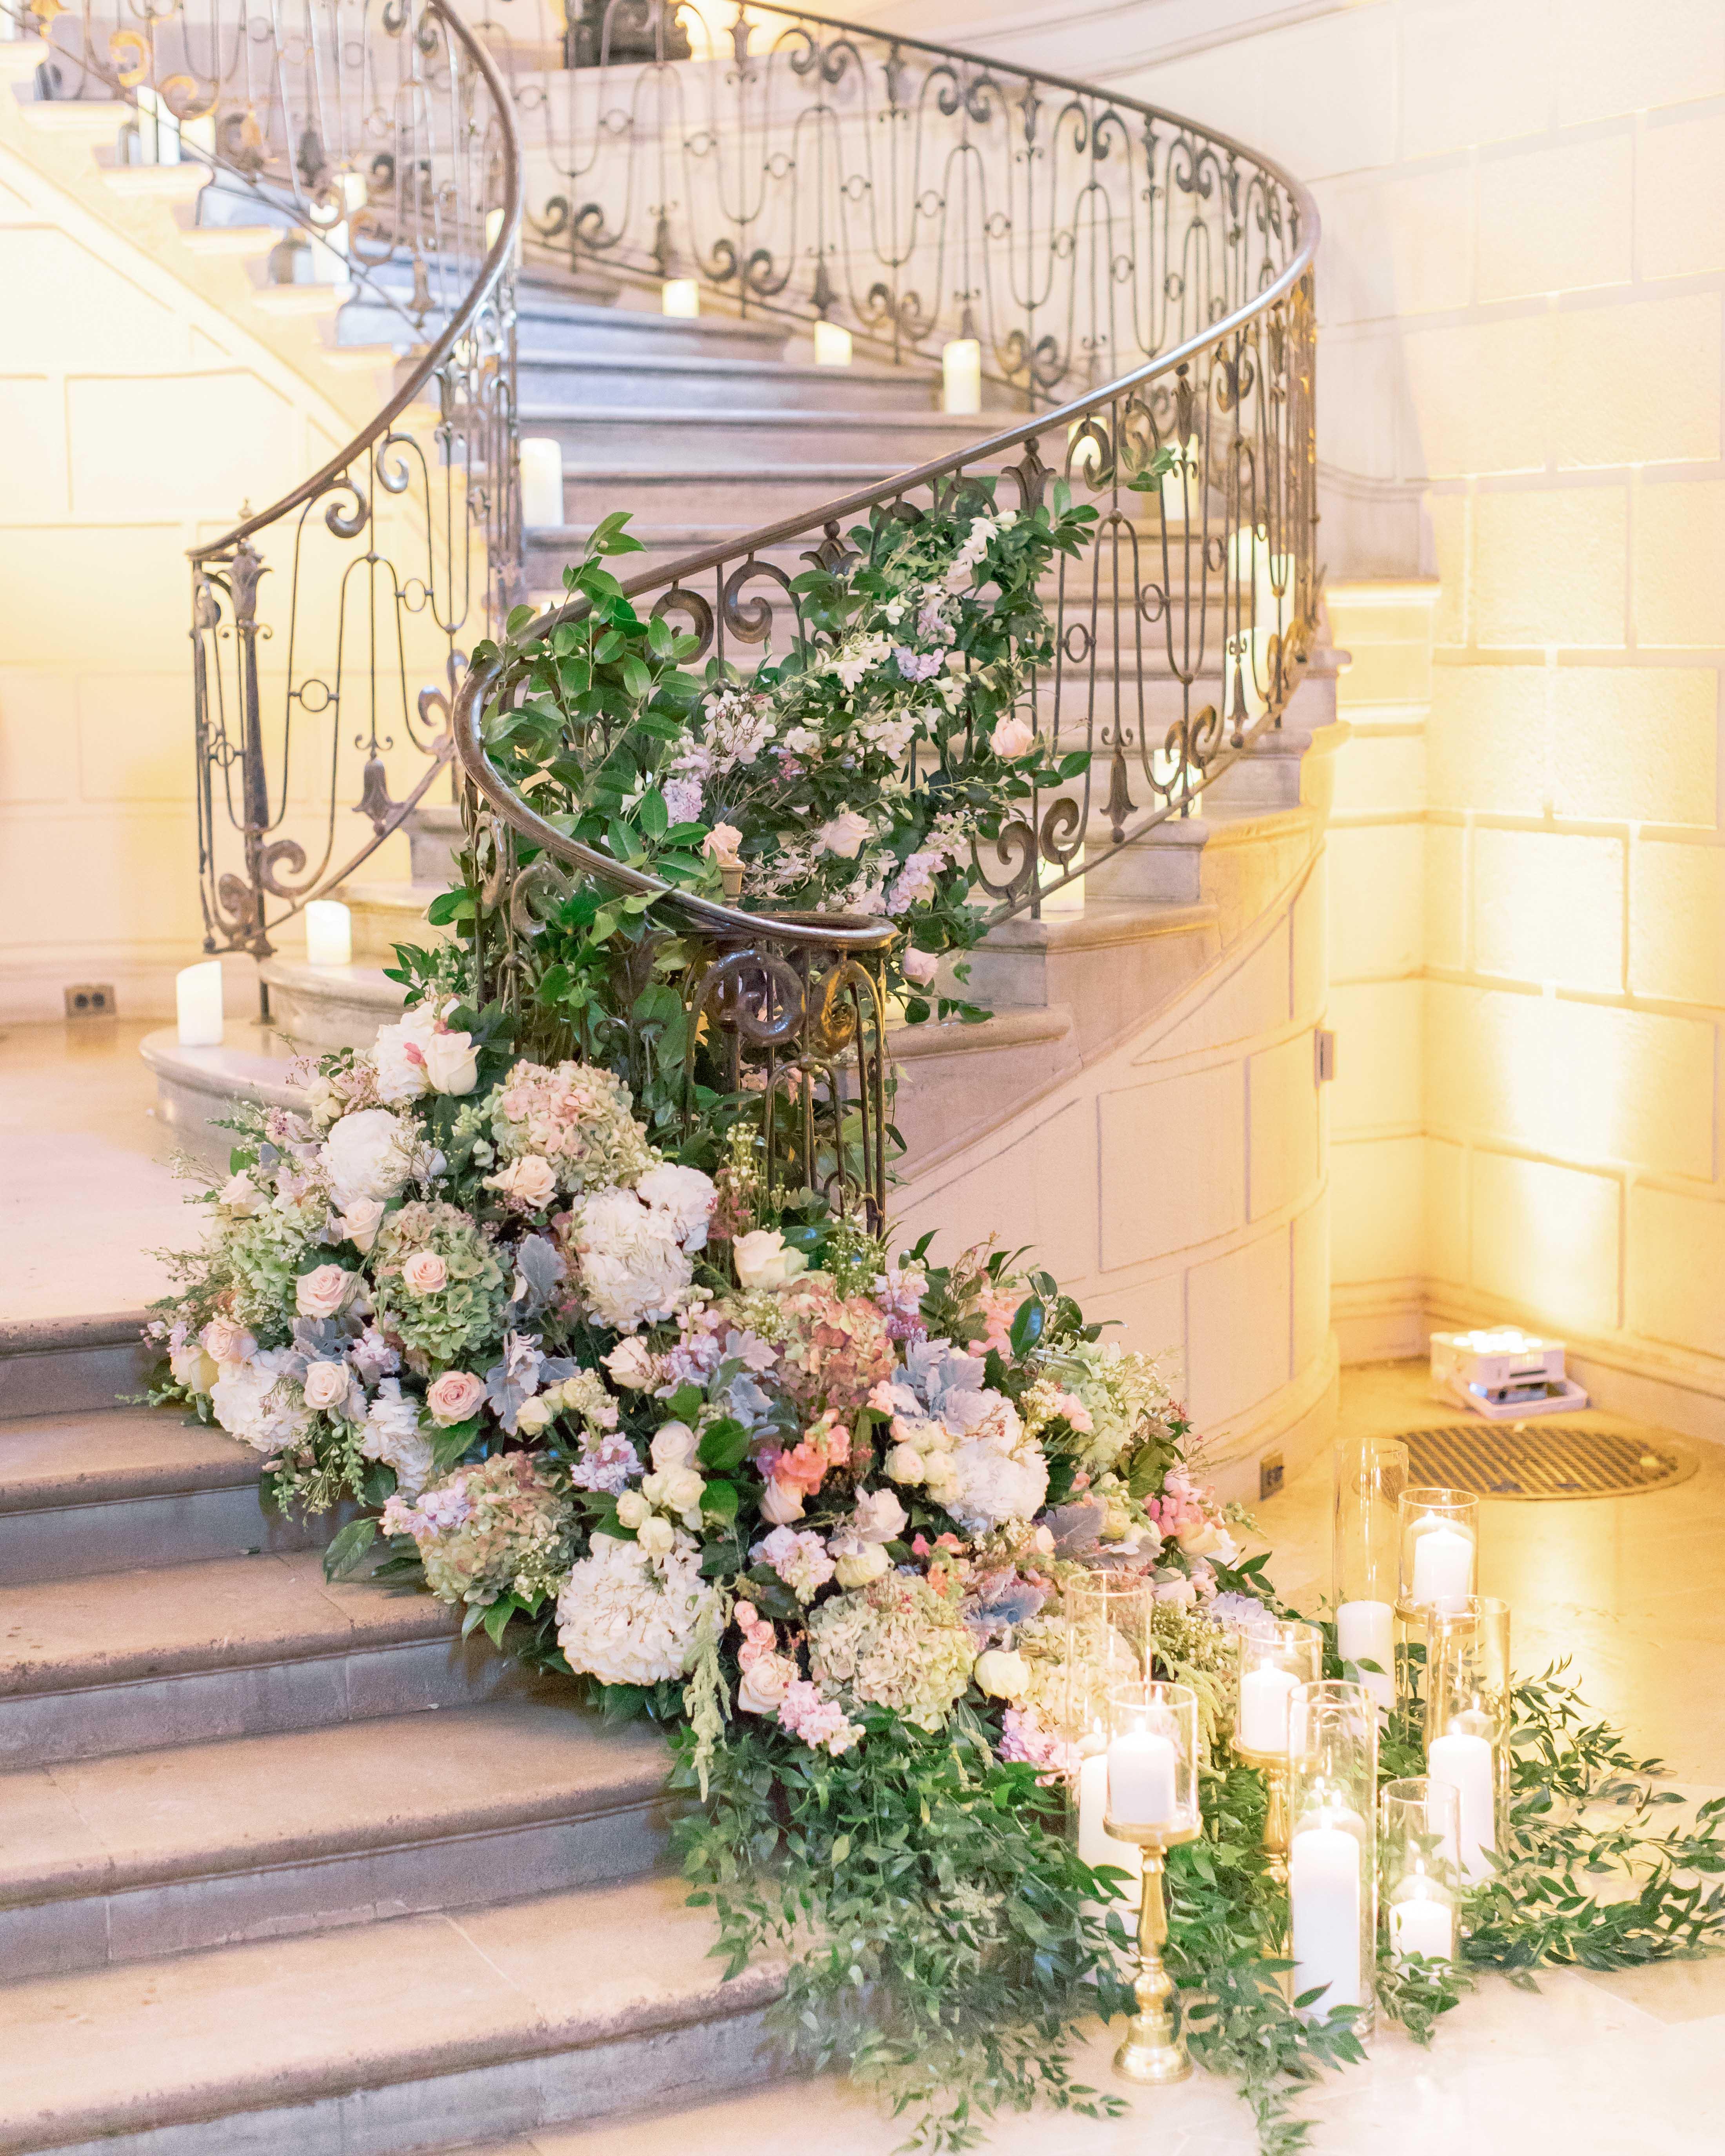 winding stair banister decor greenery hydrangea purple blooms